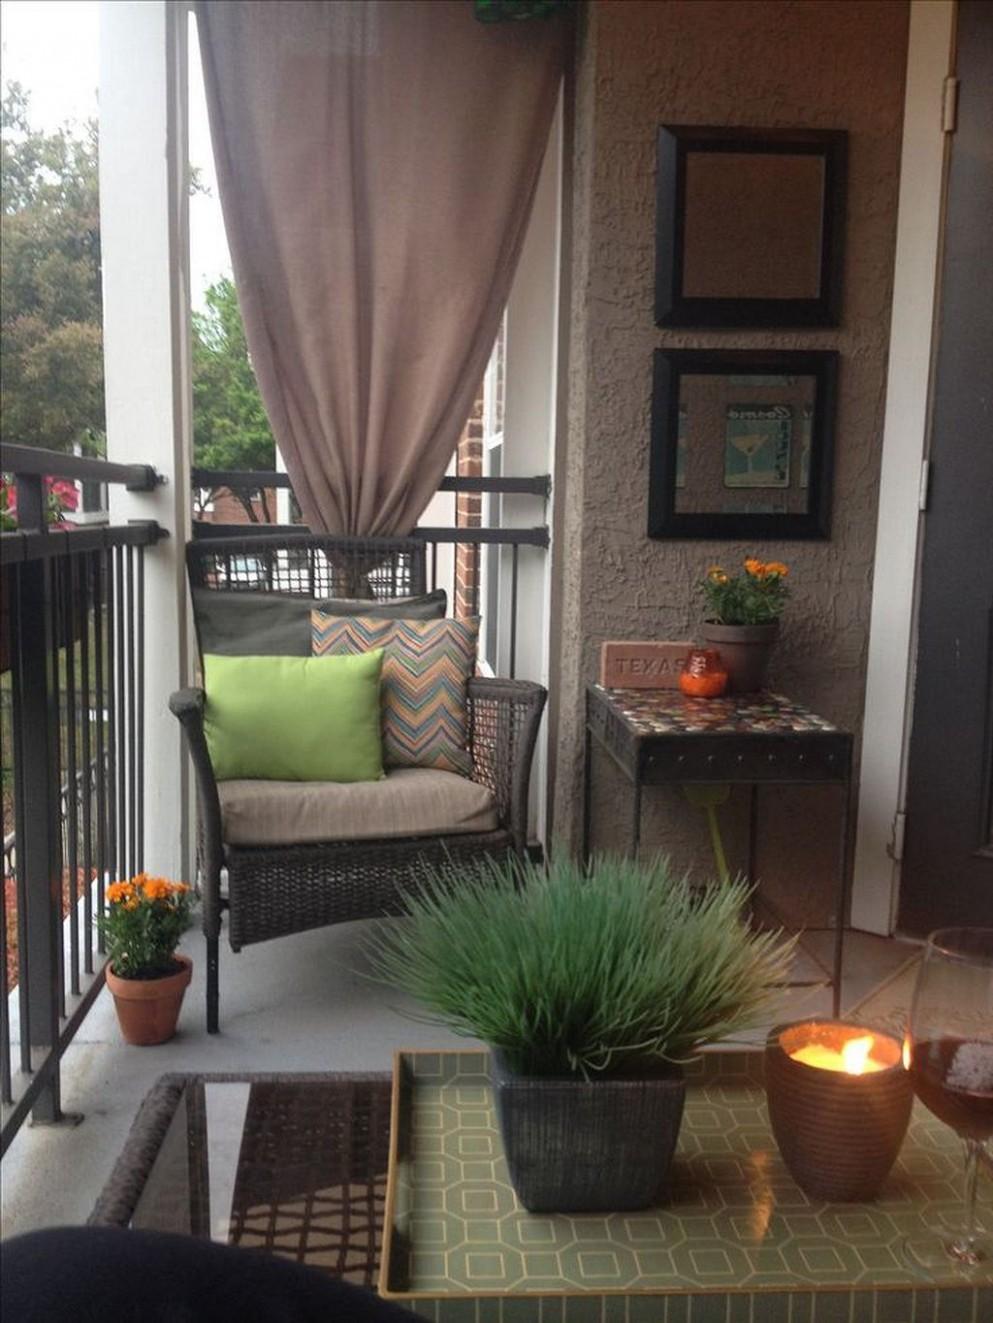 12 Creative Apartment Patio On A Budget Ideas 12  Apartment patio  - Apartment Balcony Ideas On A Budget